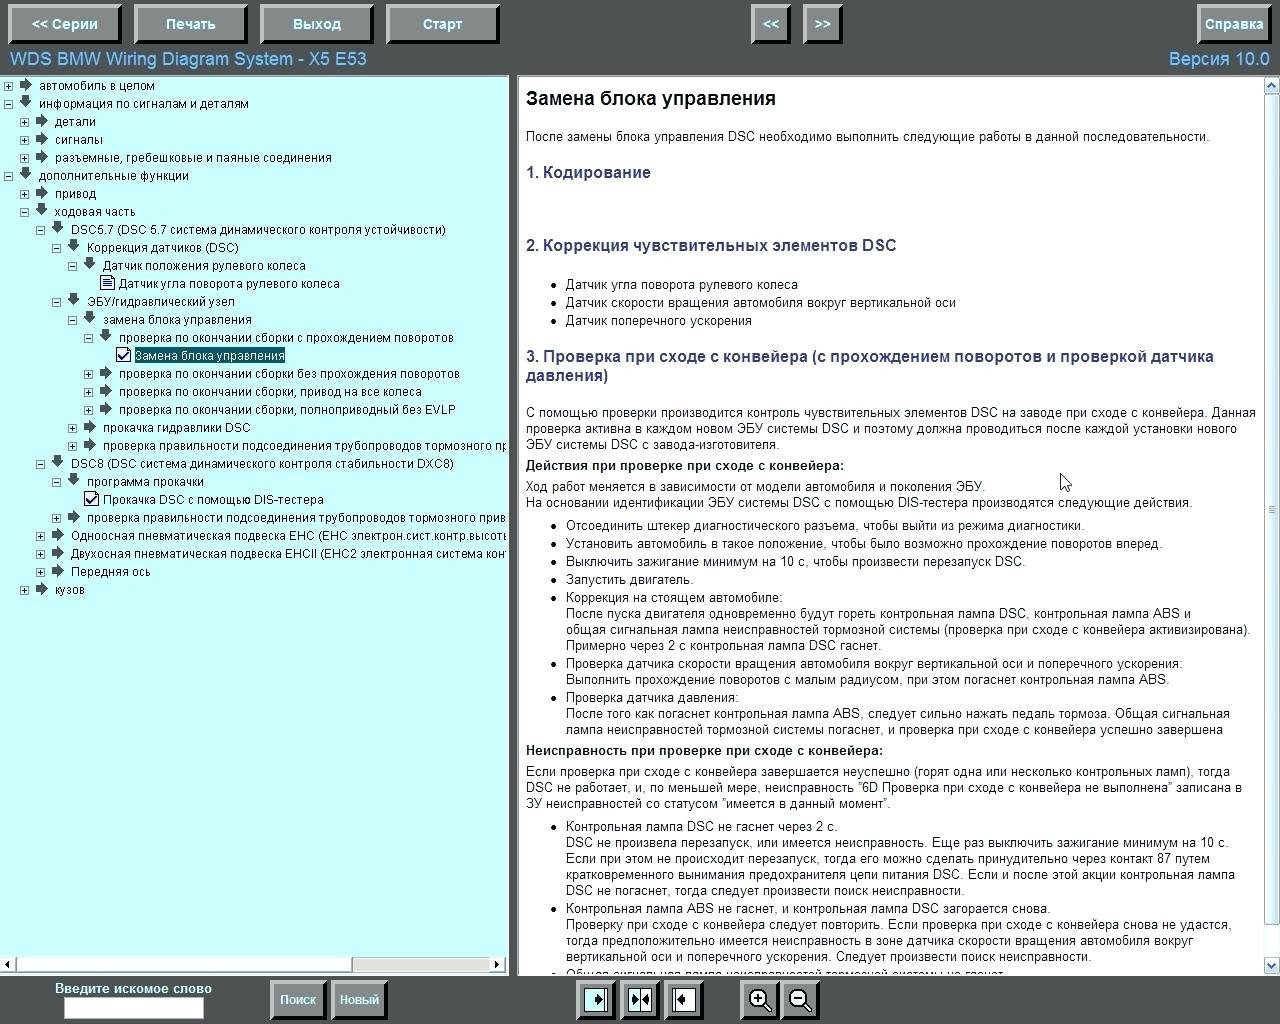 Full Size of Bmw Wds Wiring Diagram System line V120 3 4 N Blog U 1